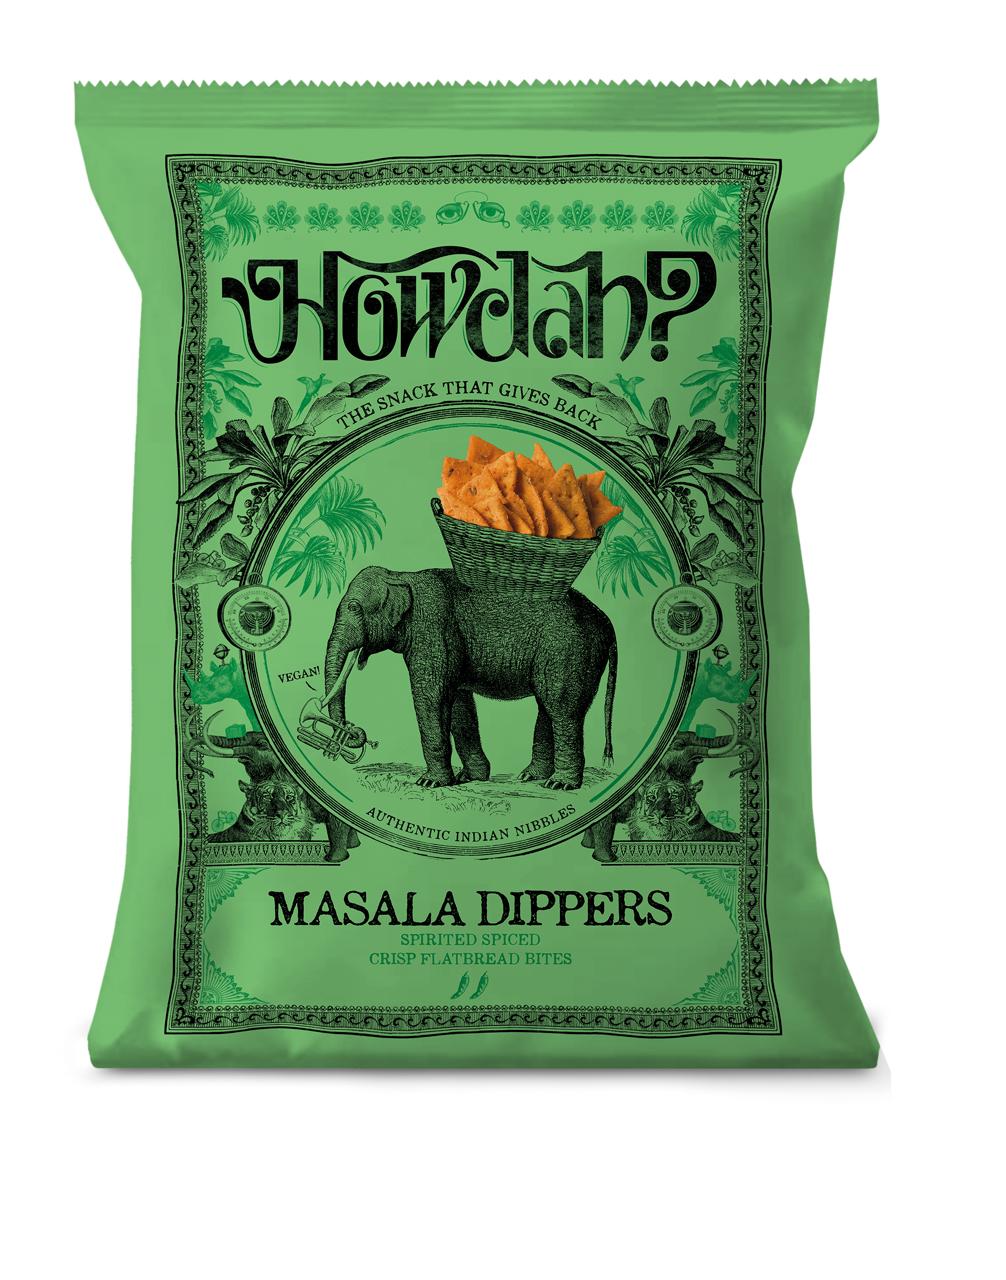 Howdah Masala Dippers - 150g.